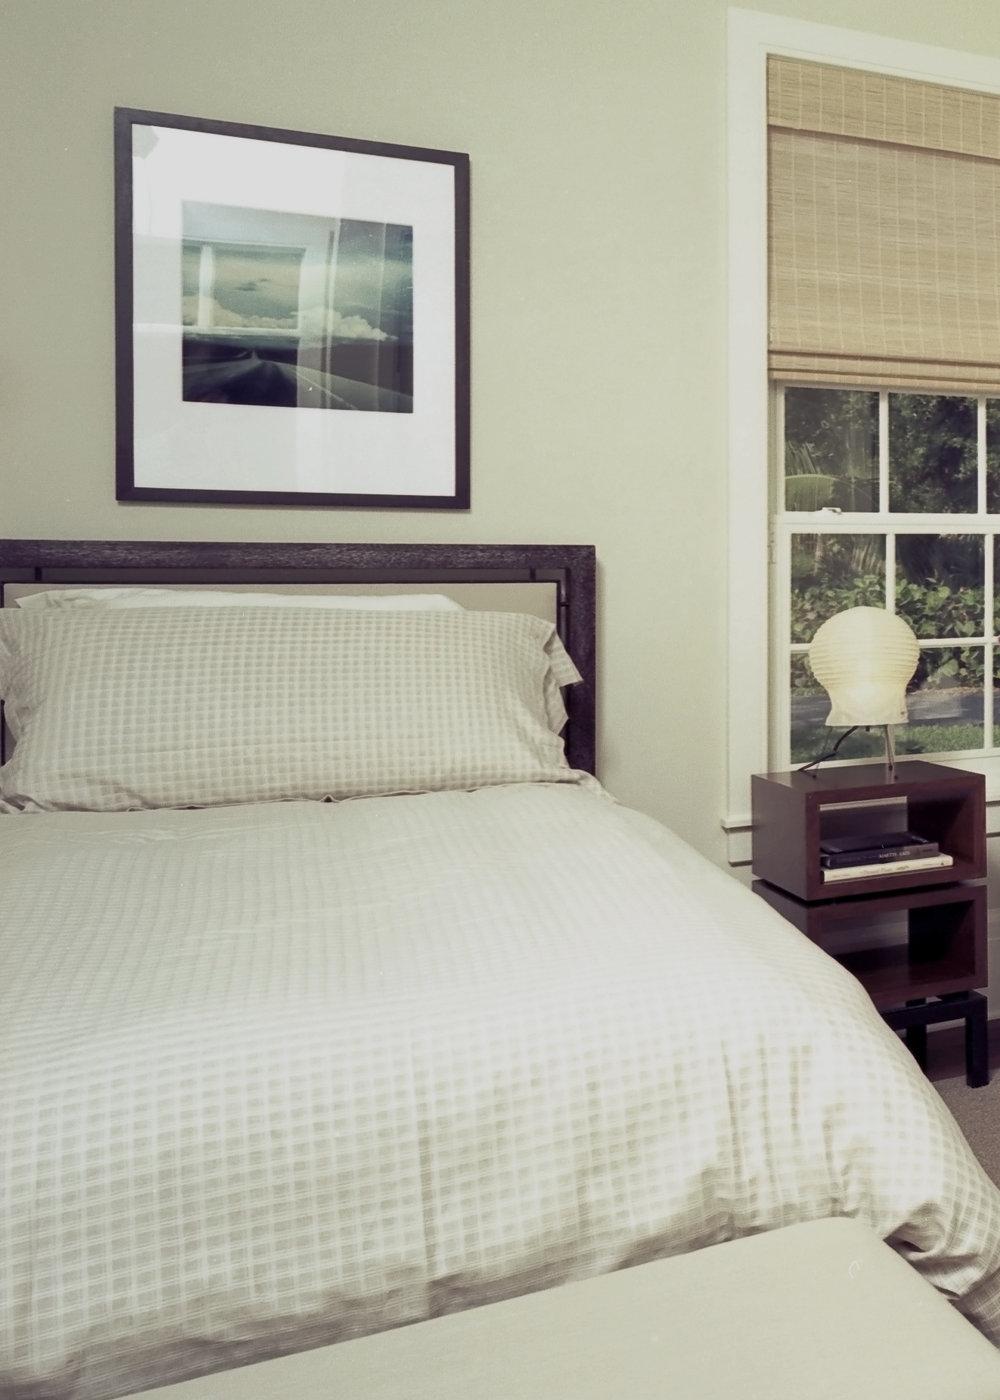 Buest Bedroom Robinson_edited-1.jpg